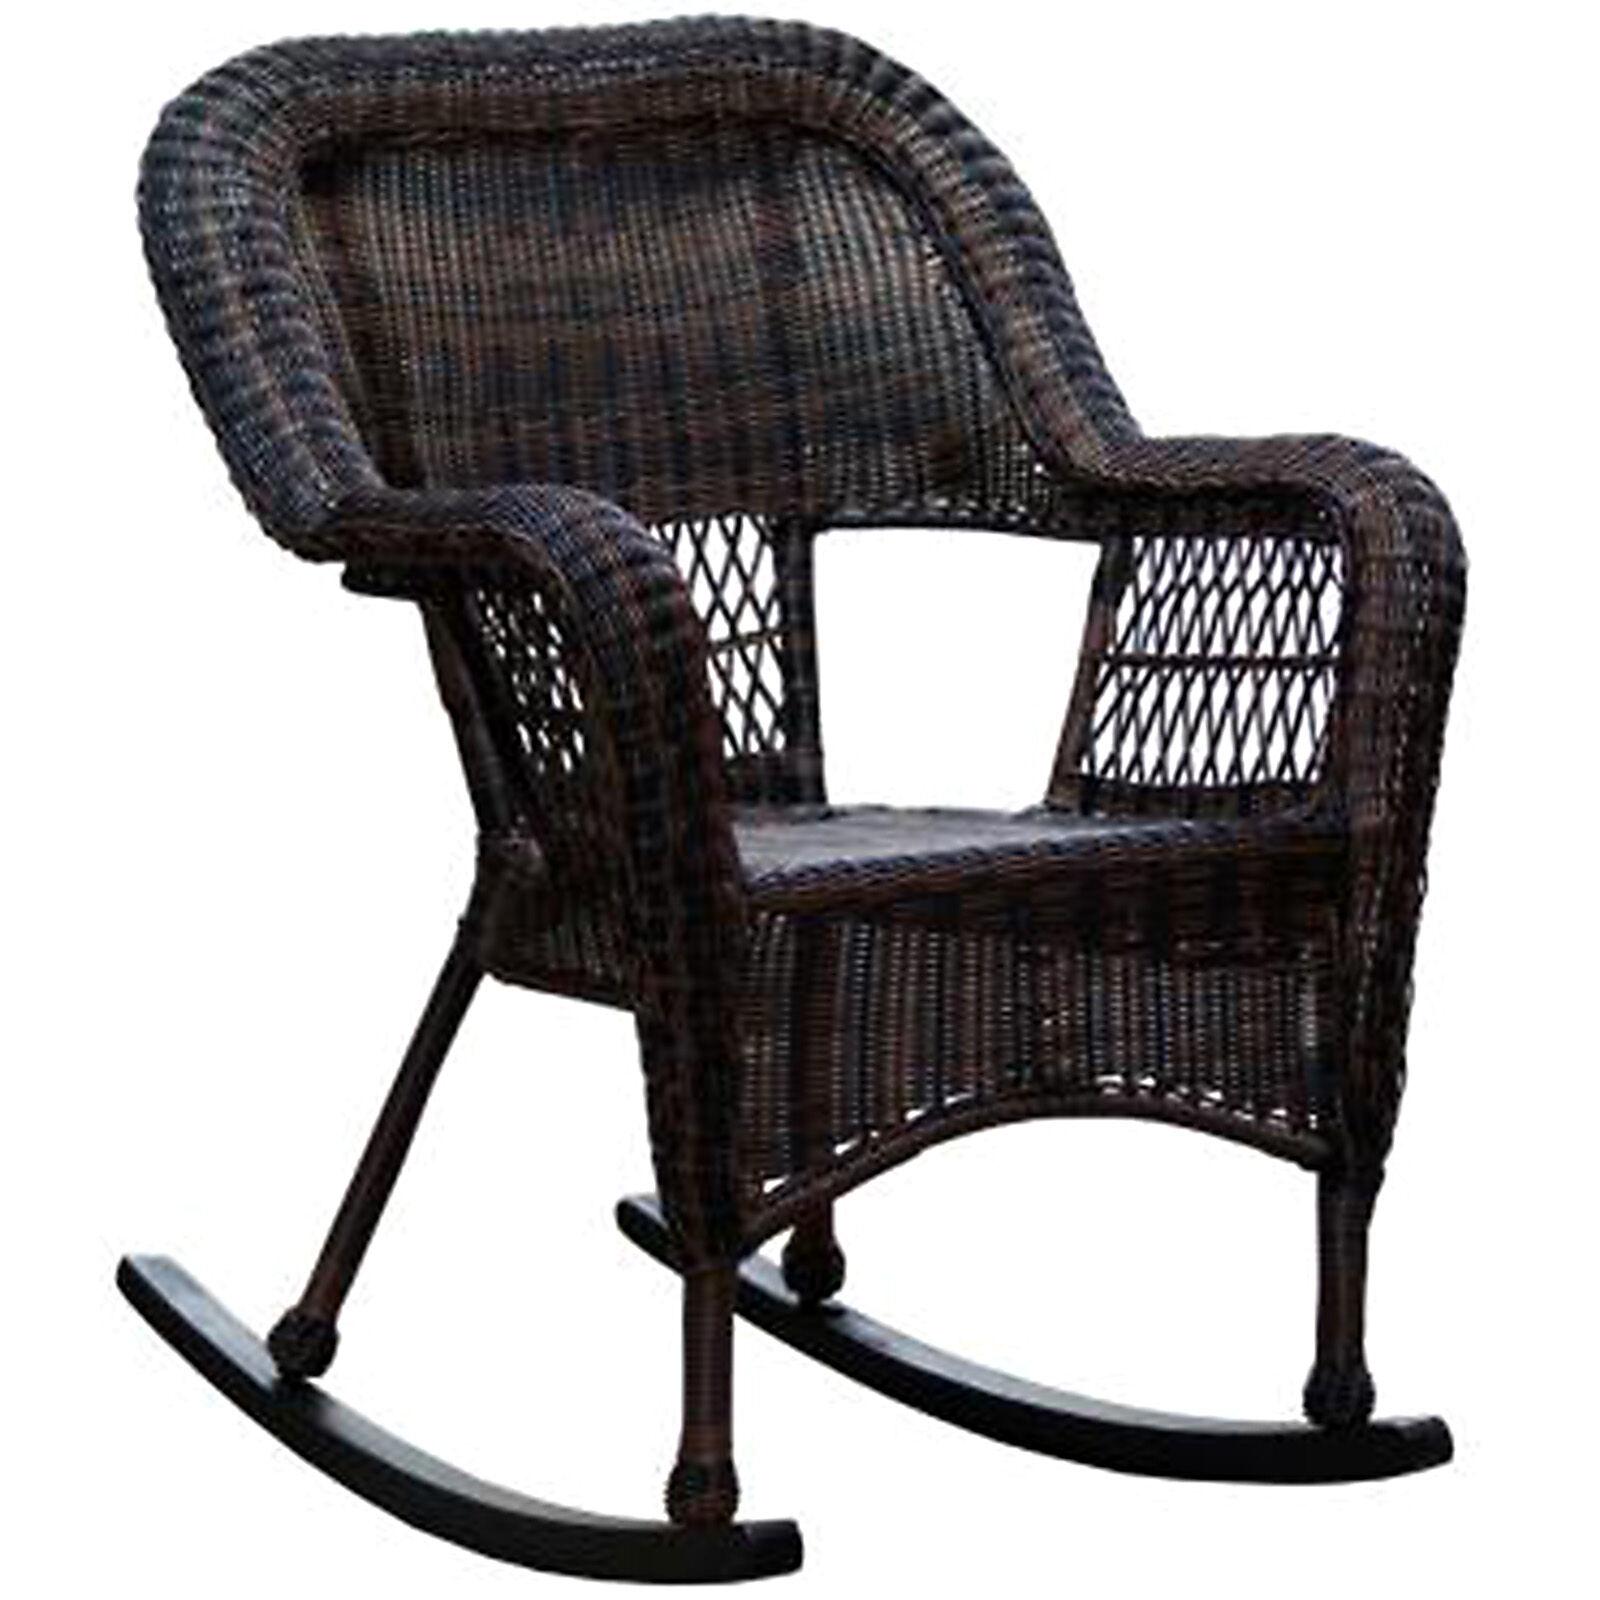 Marvelous Dark Brown Wicker Outdoor Patio Rocking Chair ...